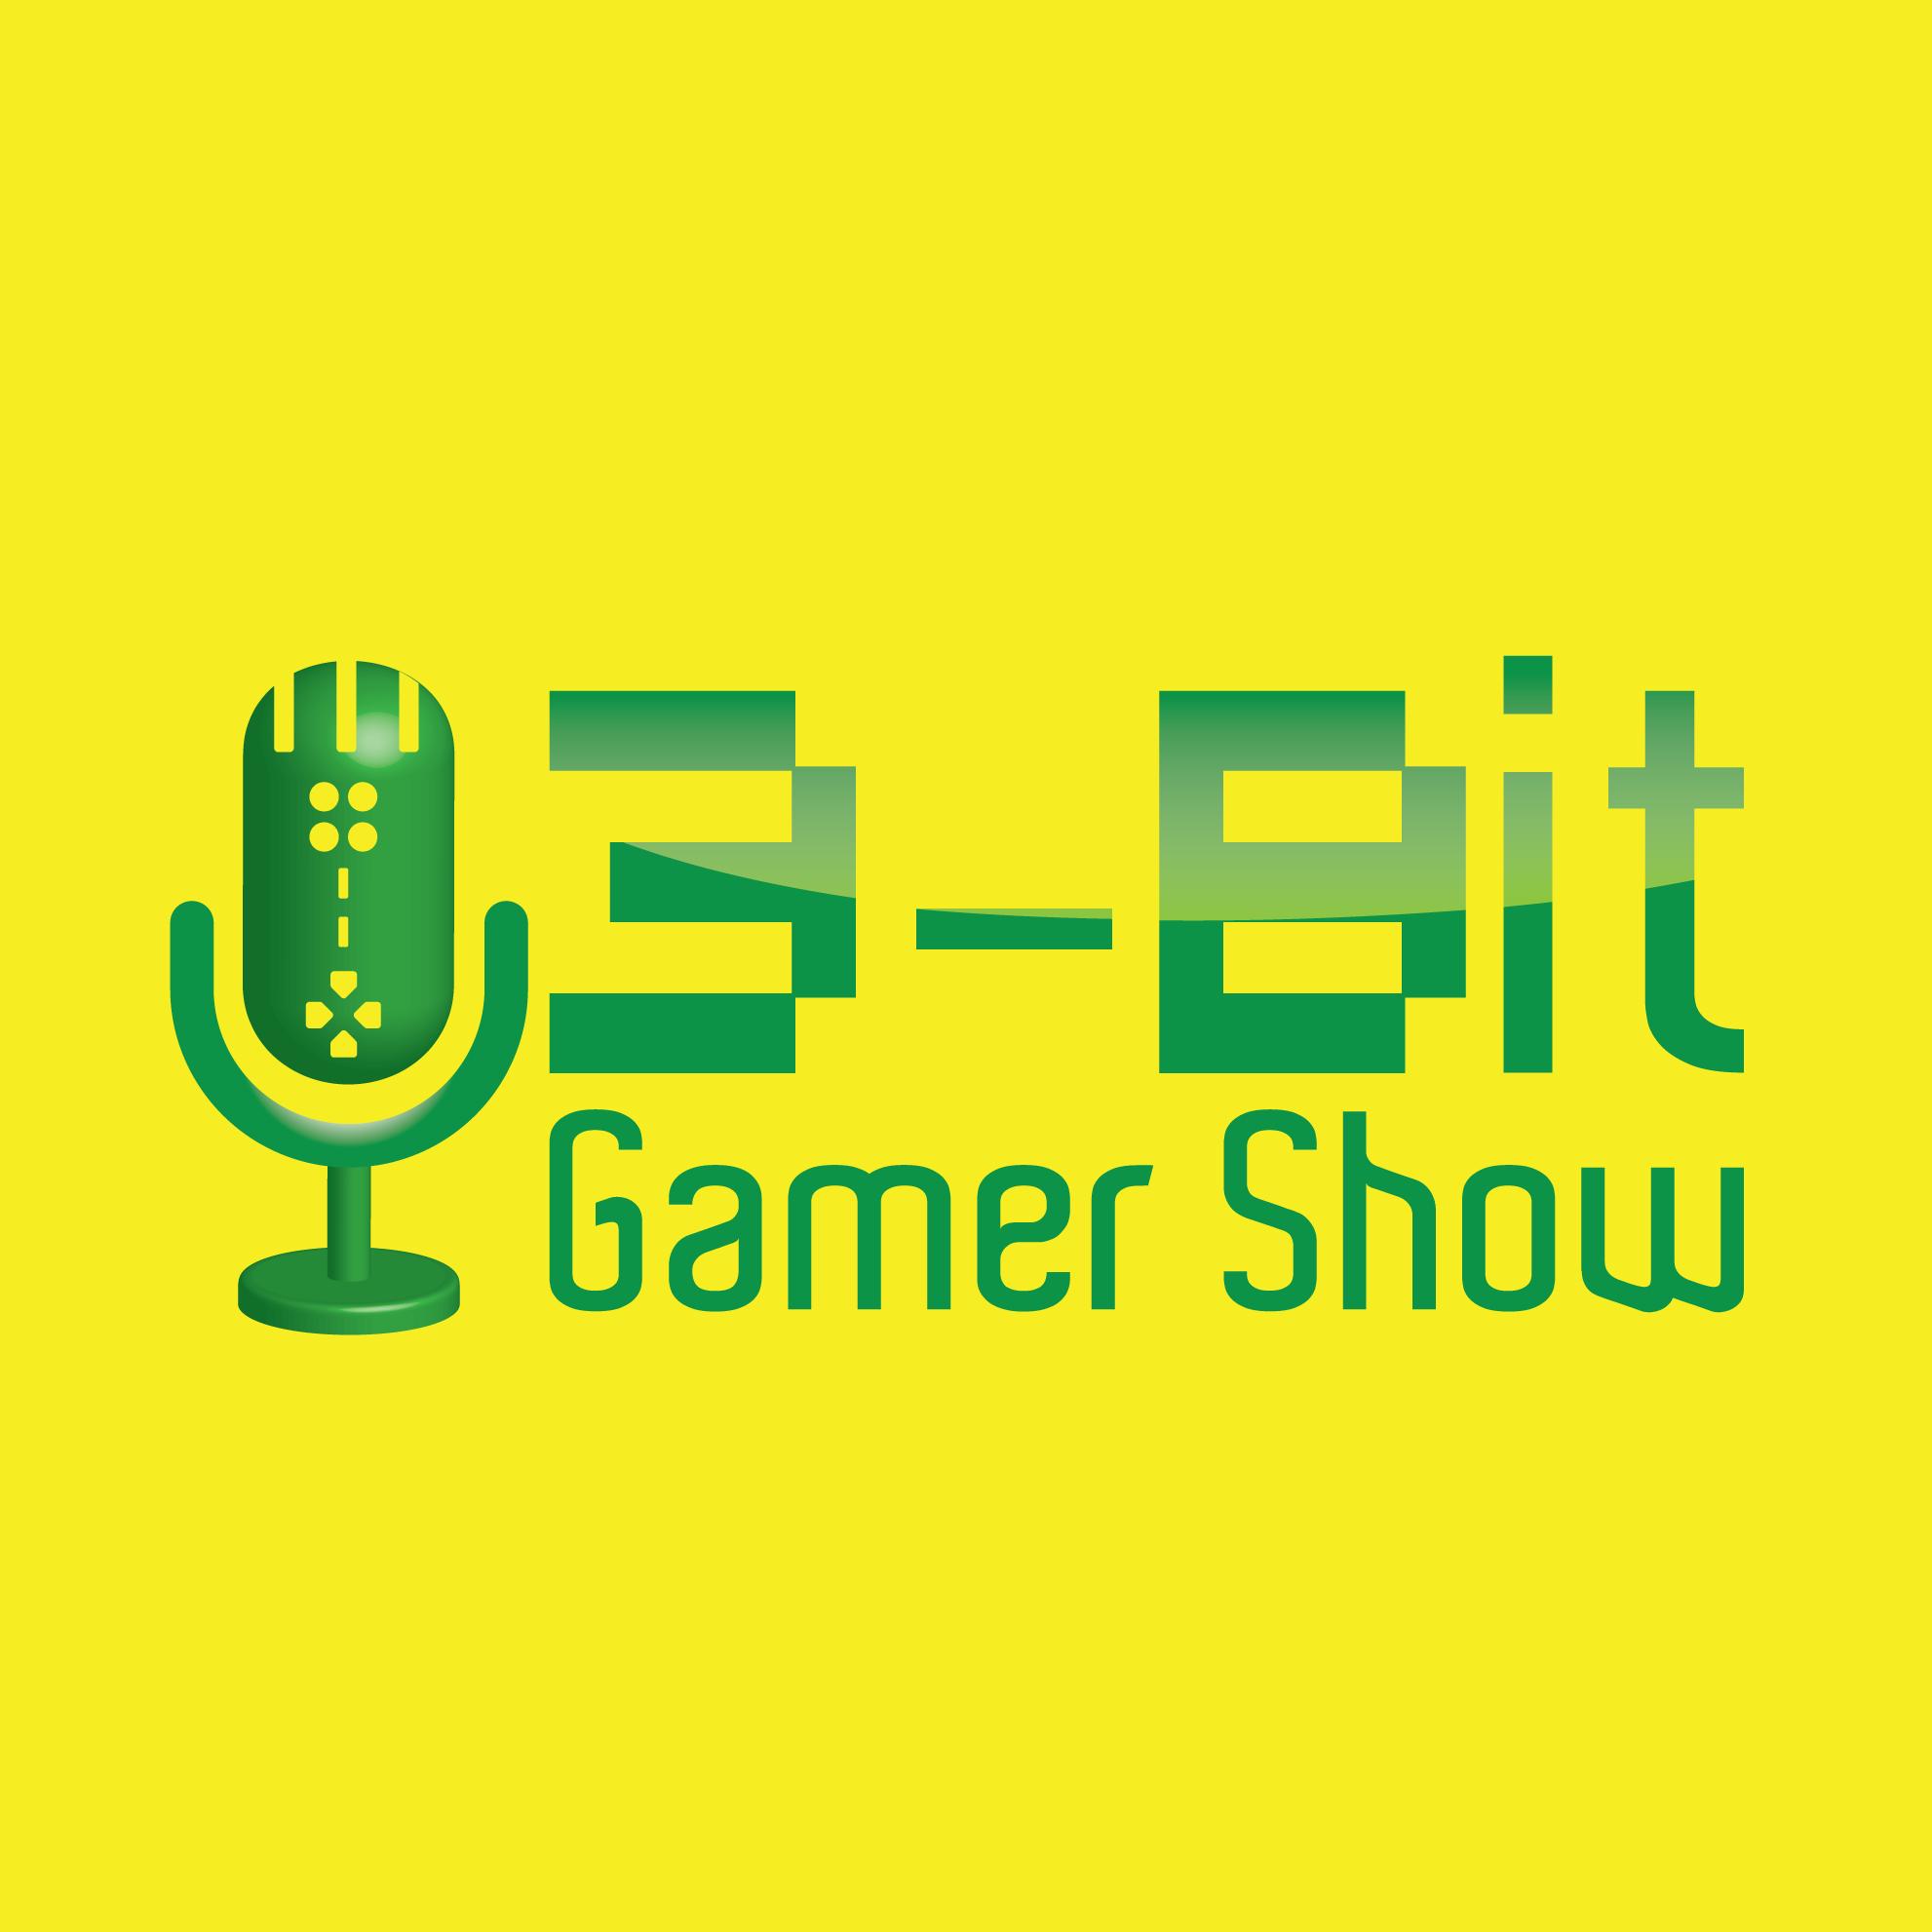 3-bit Gamer Show channel image